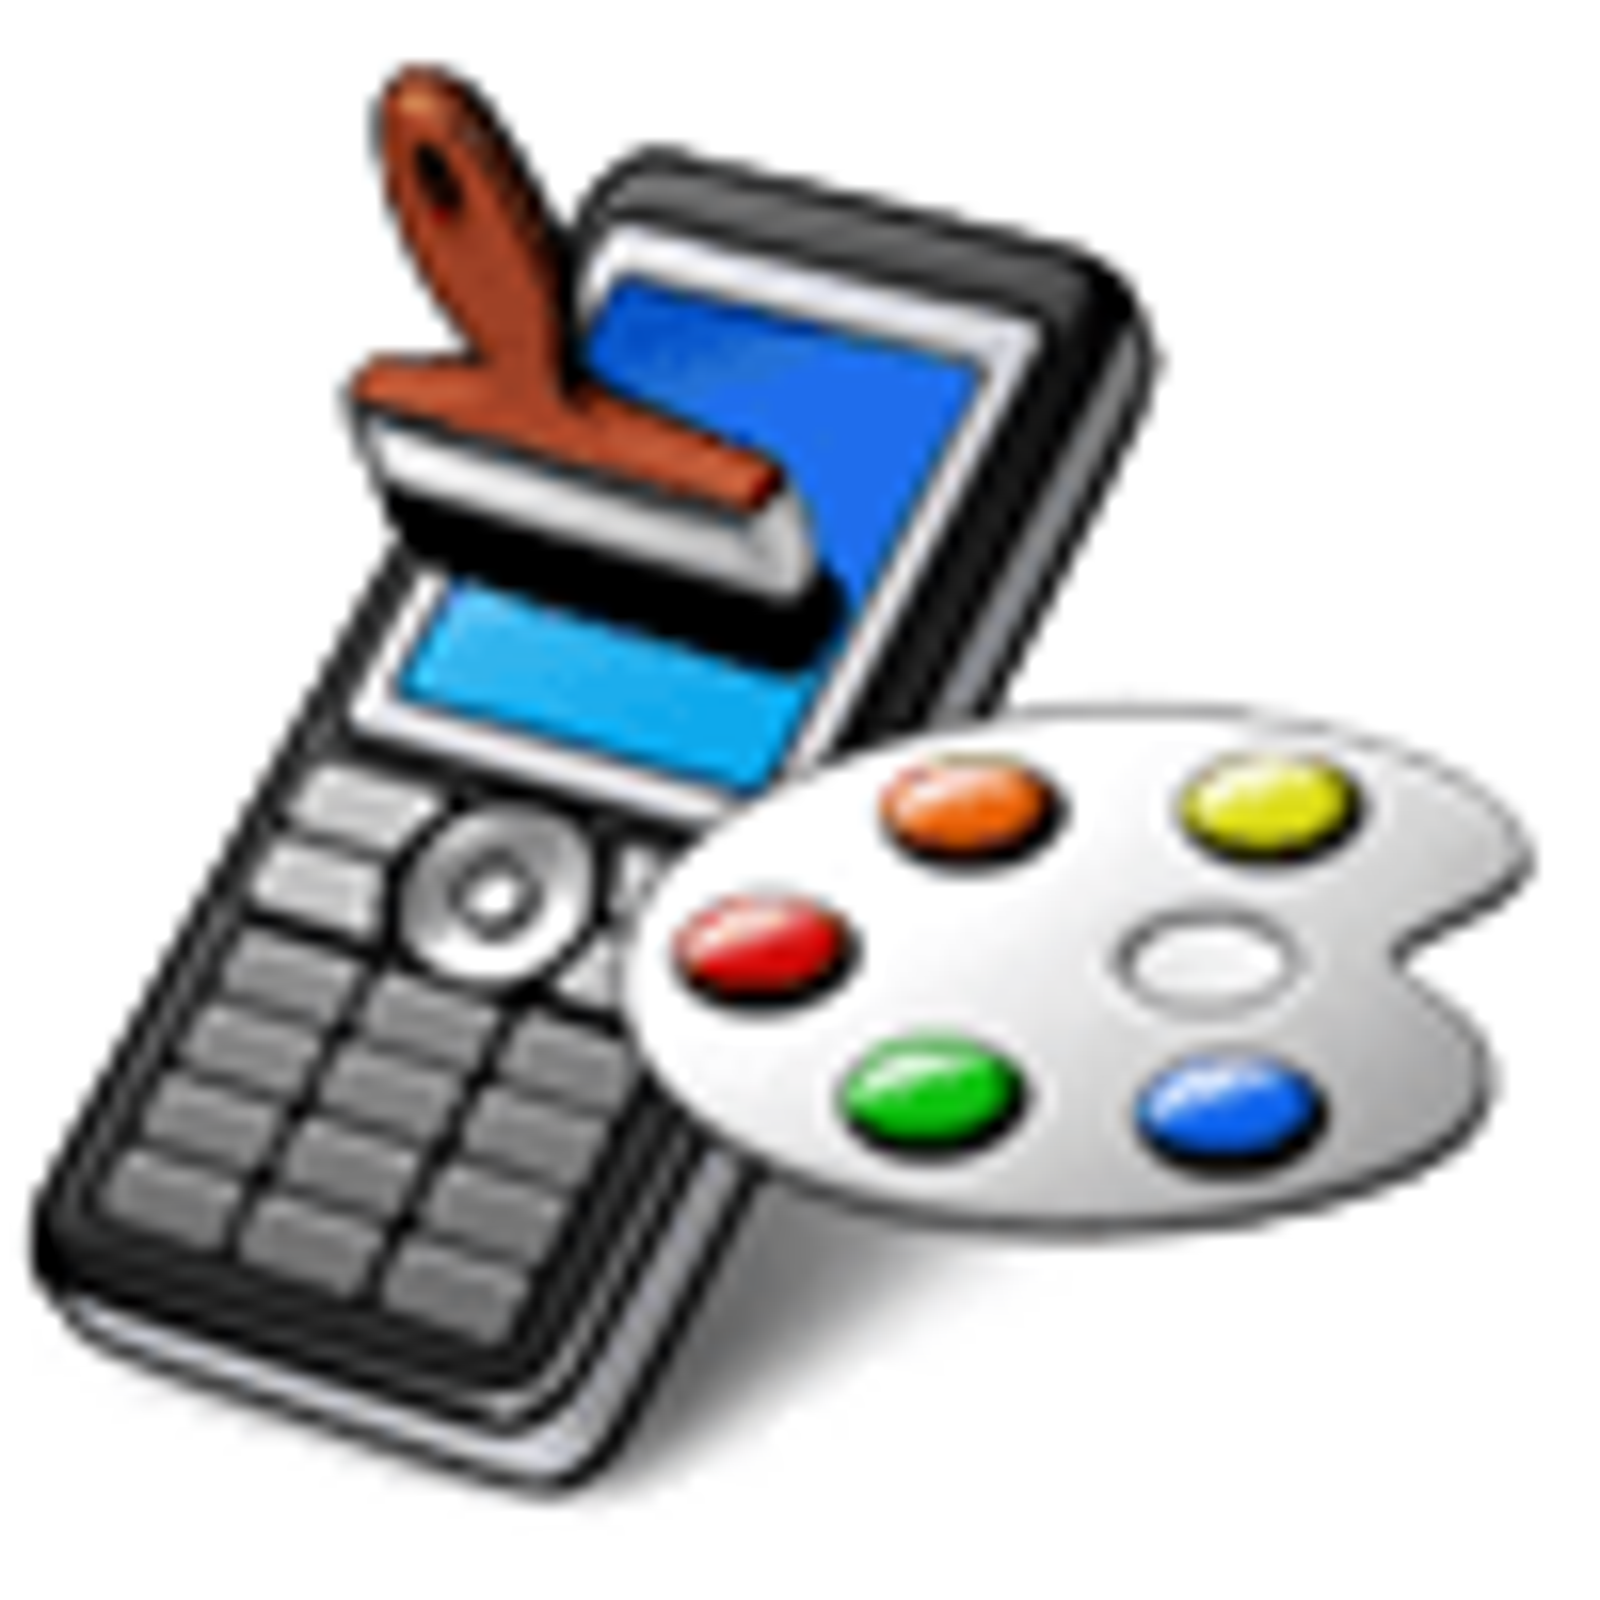 Sony Ericsson Themes Creator for Mac OS